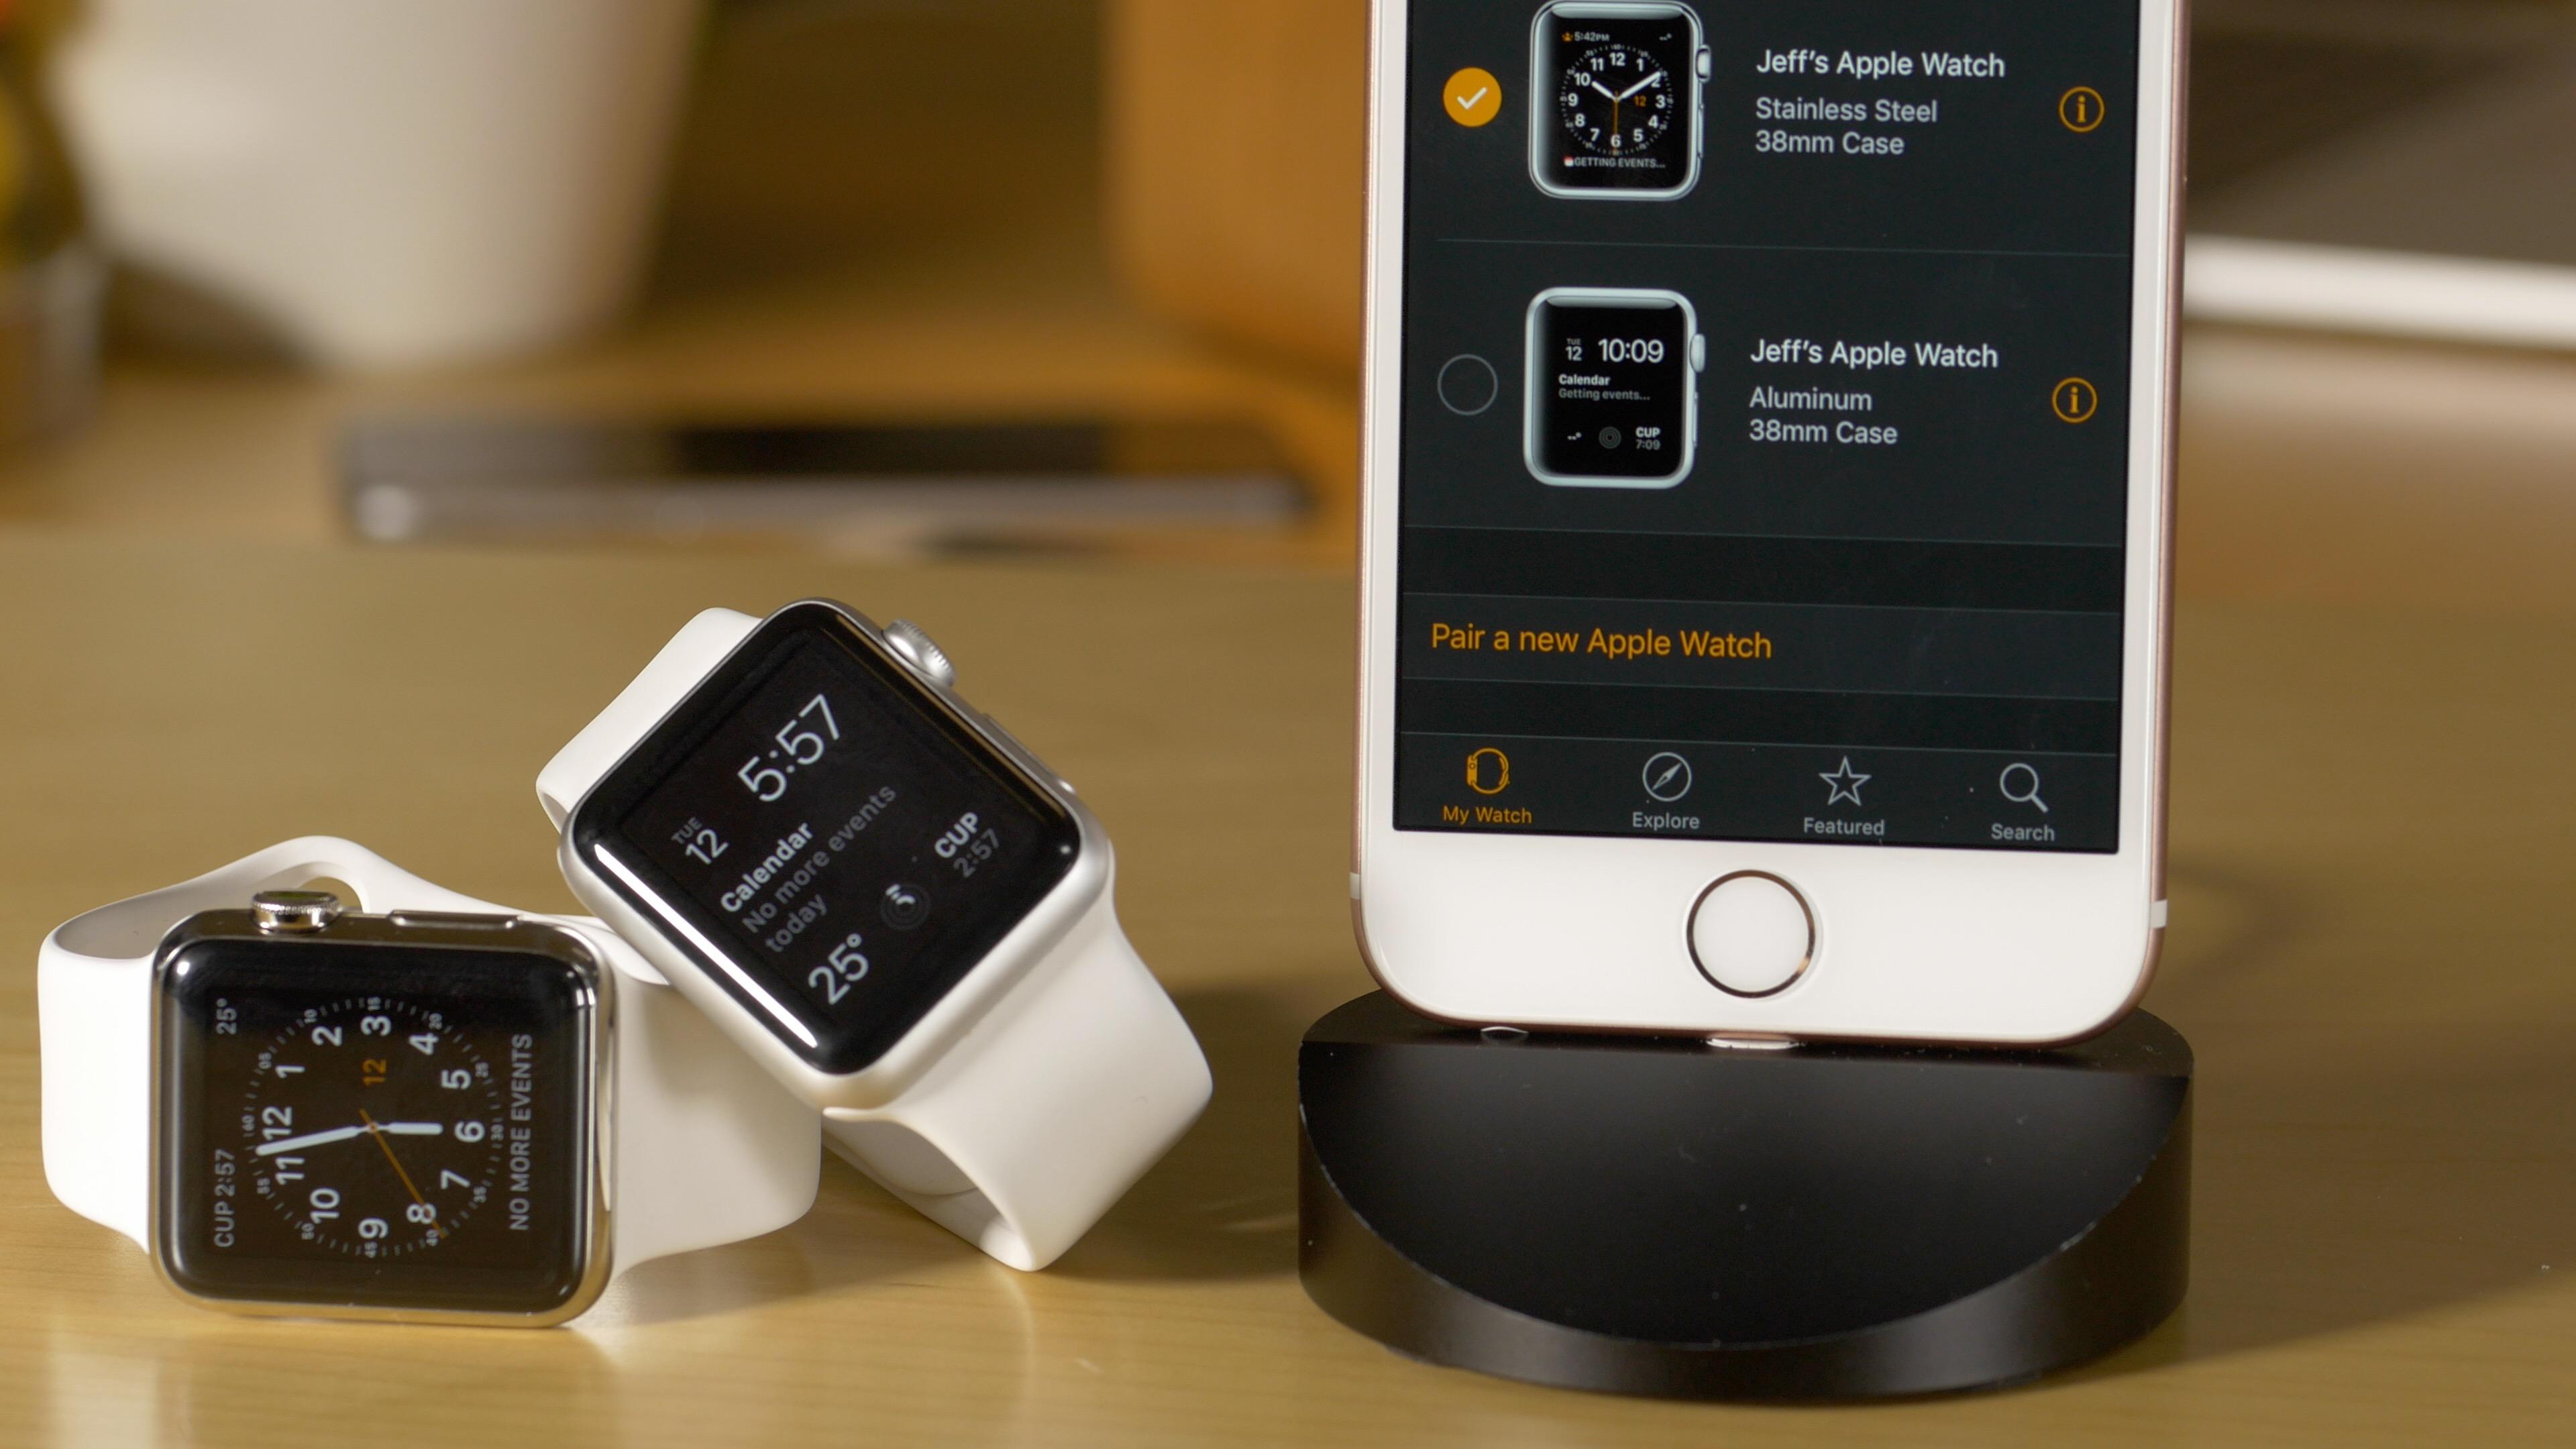 Multiple Apple Watch Pairing